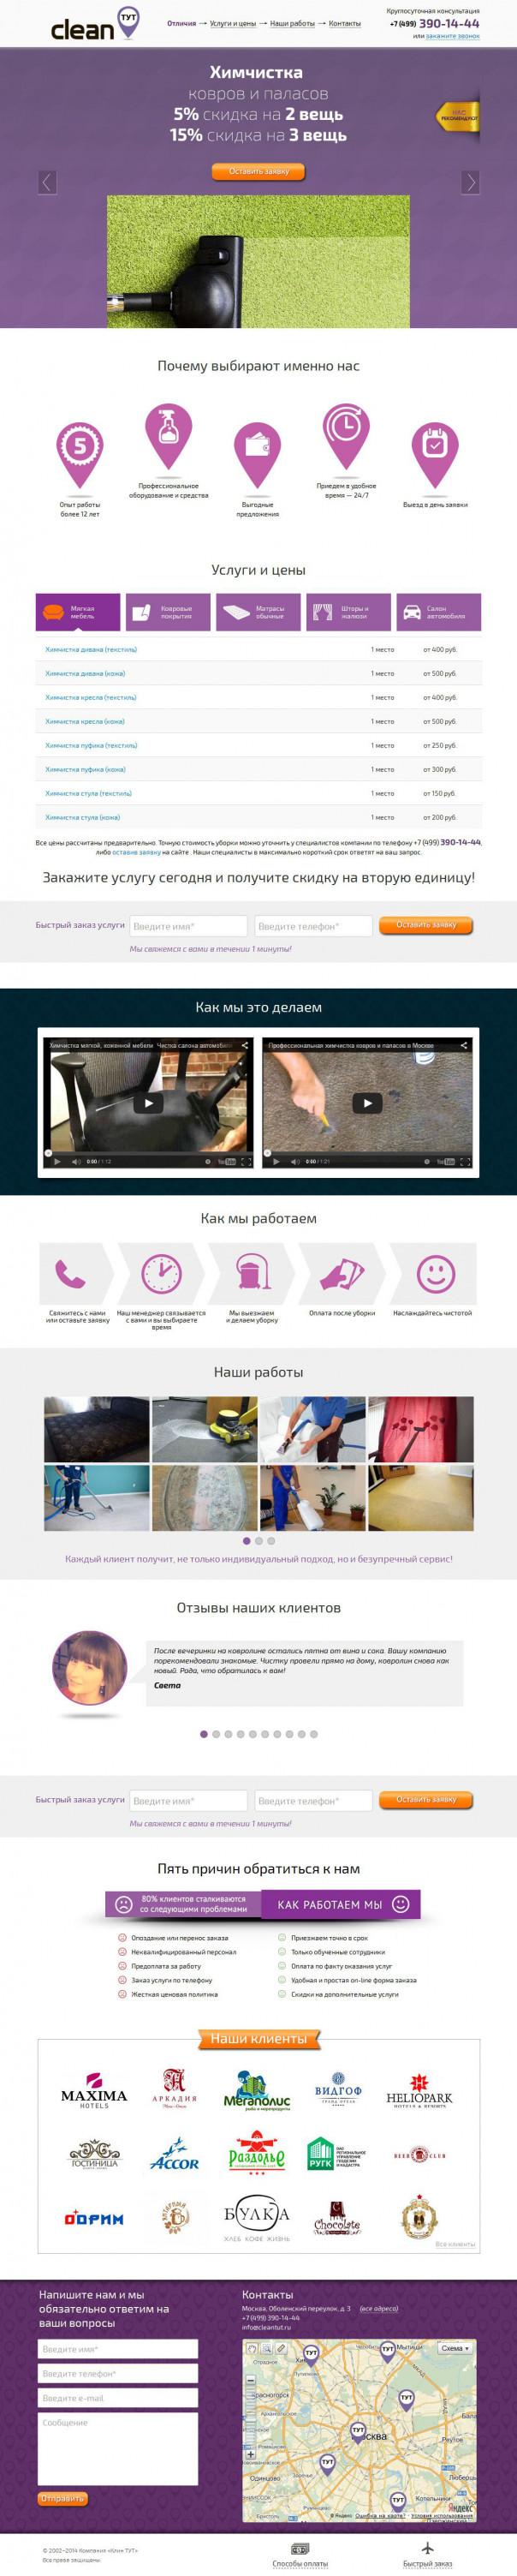 Landing page Cleantut